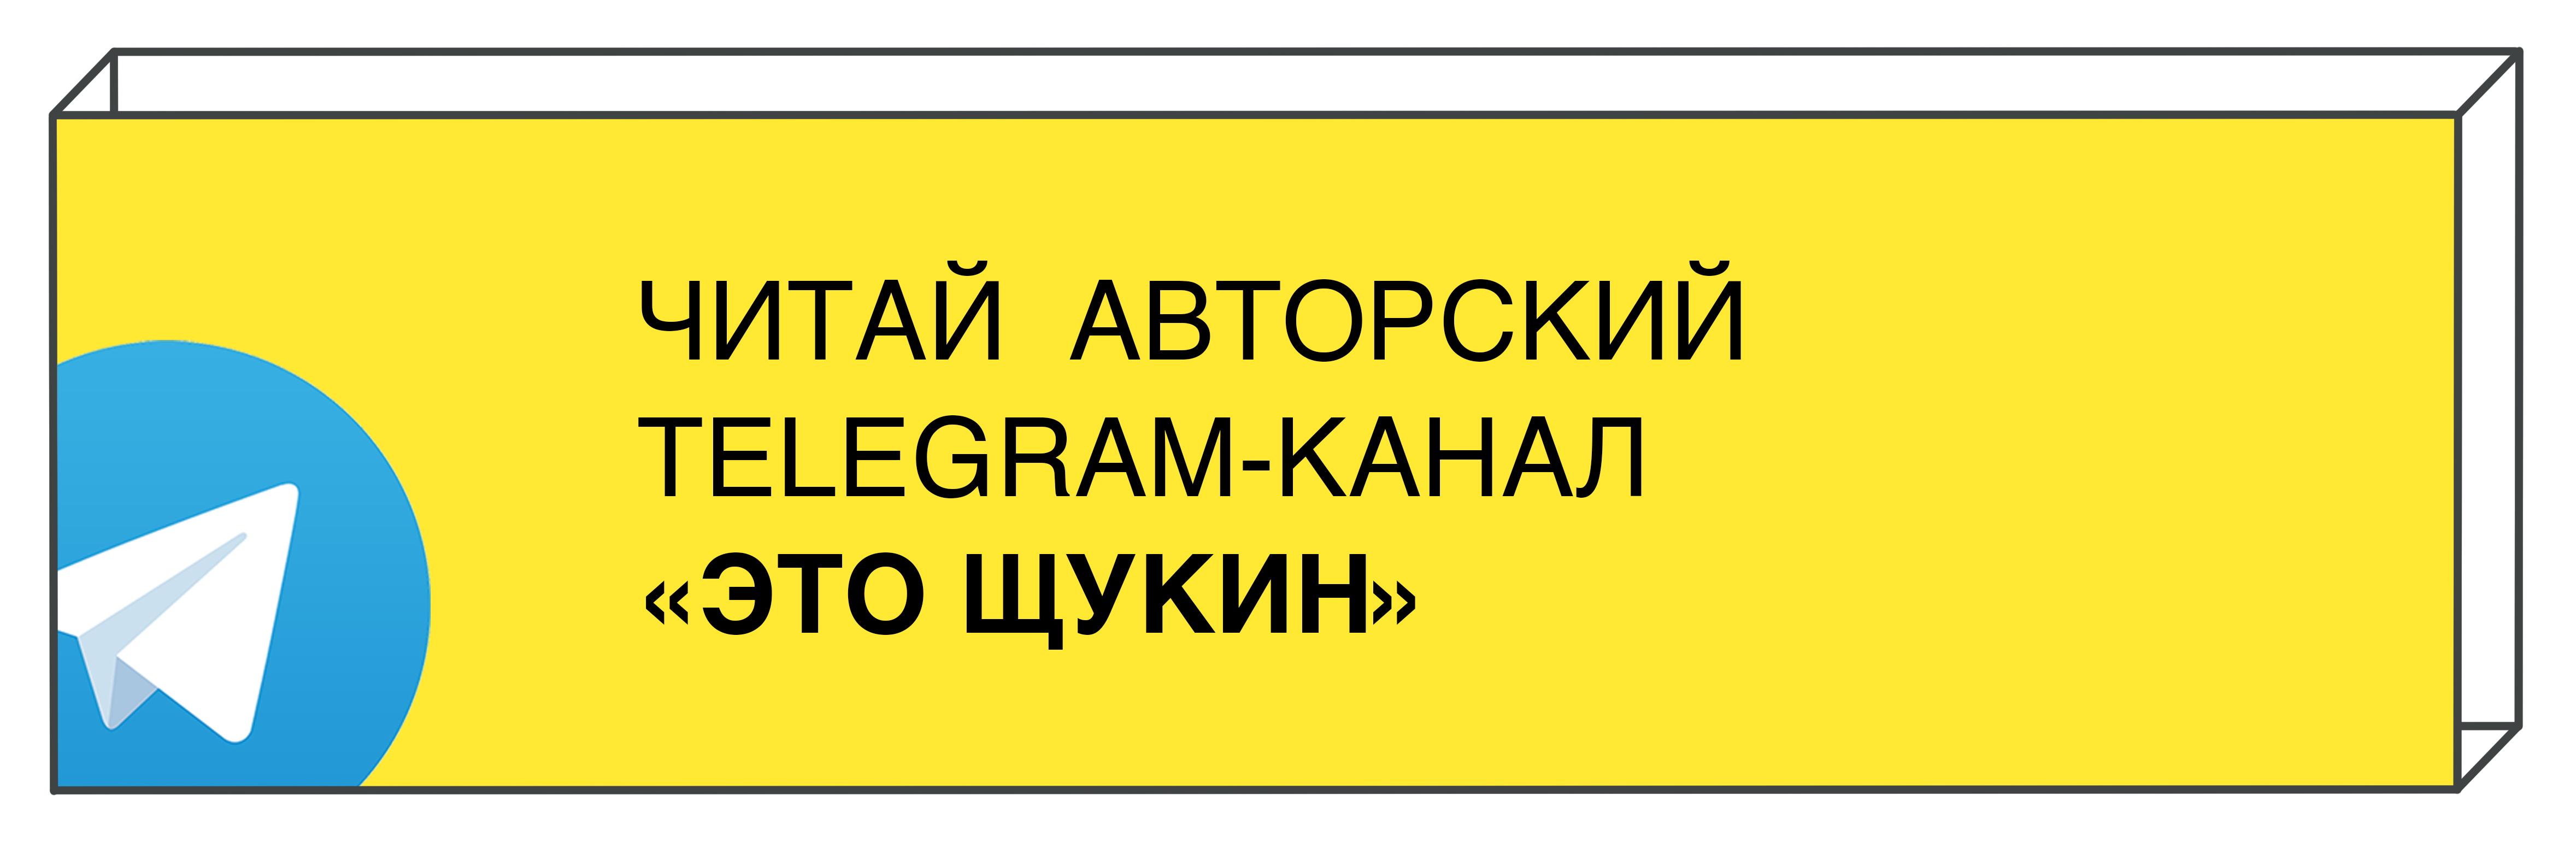 https://tele.click/itsShchukin